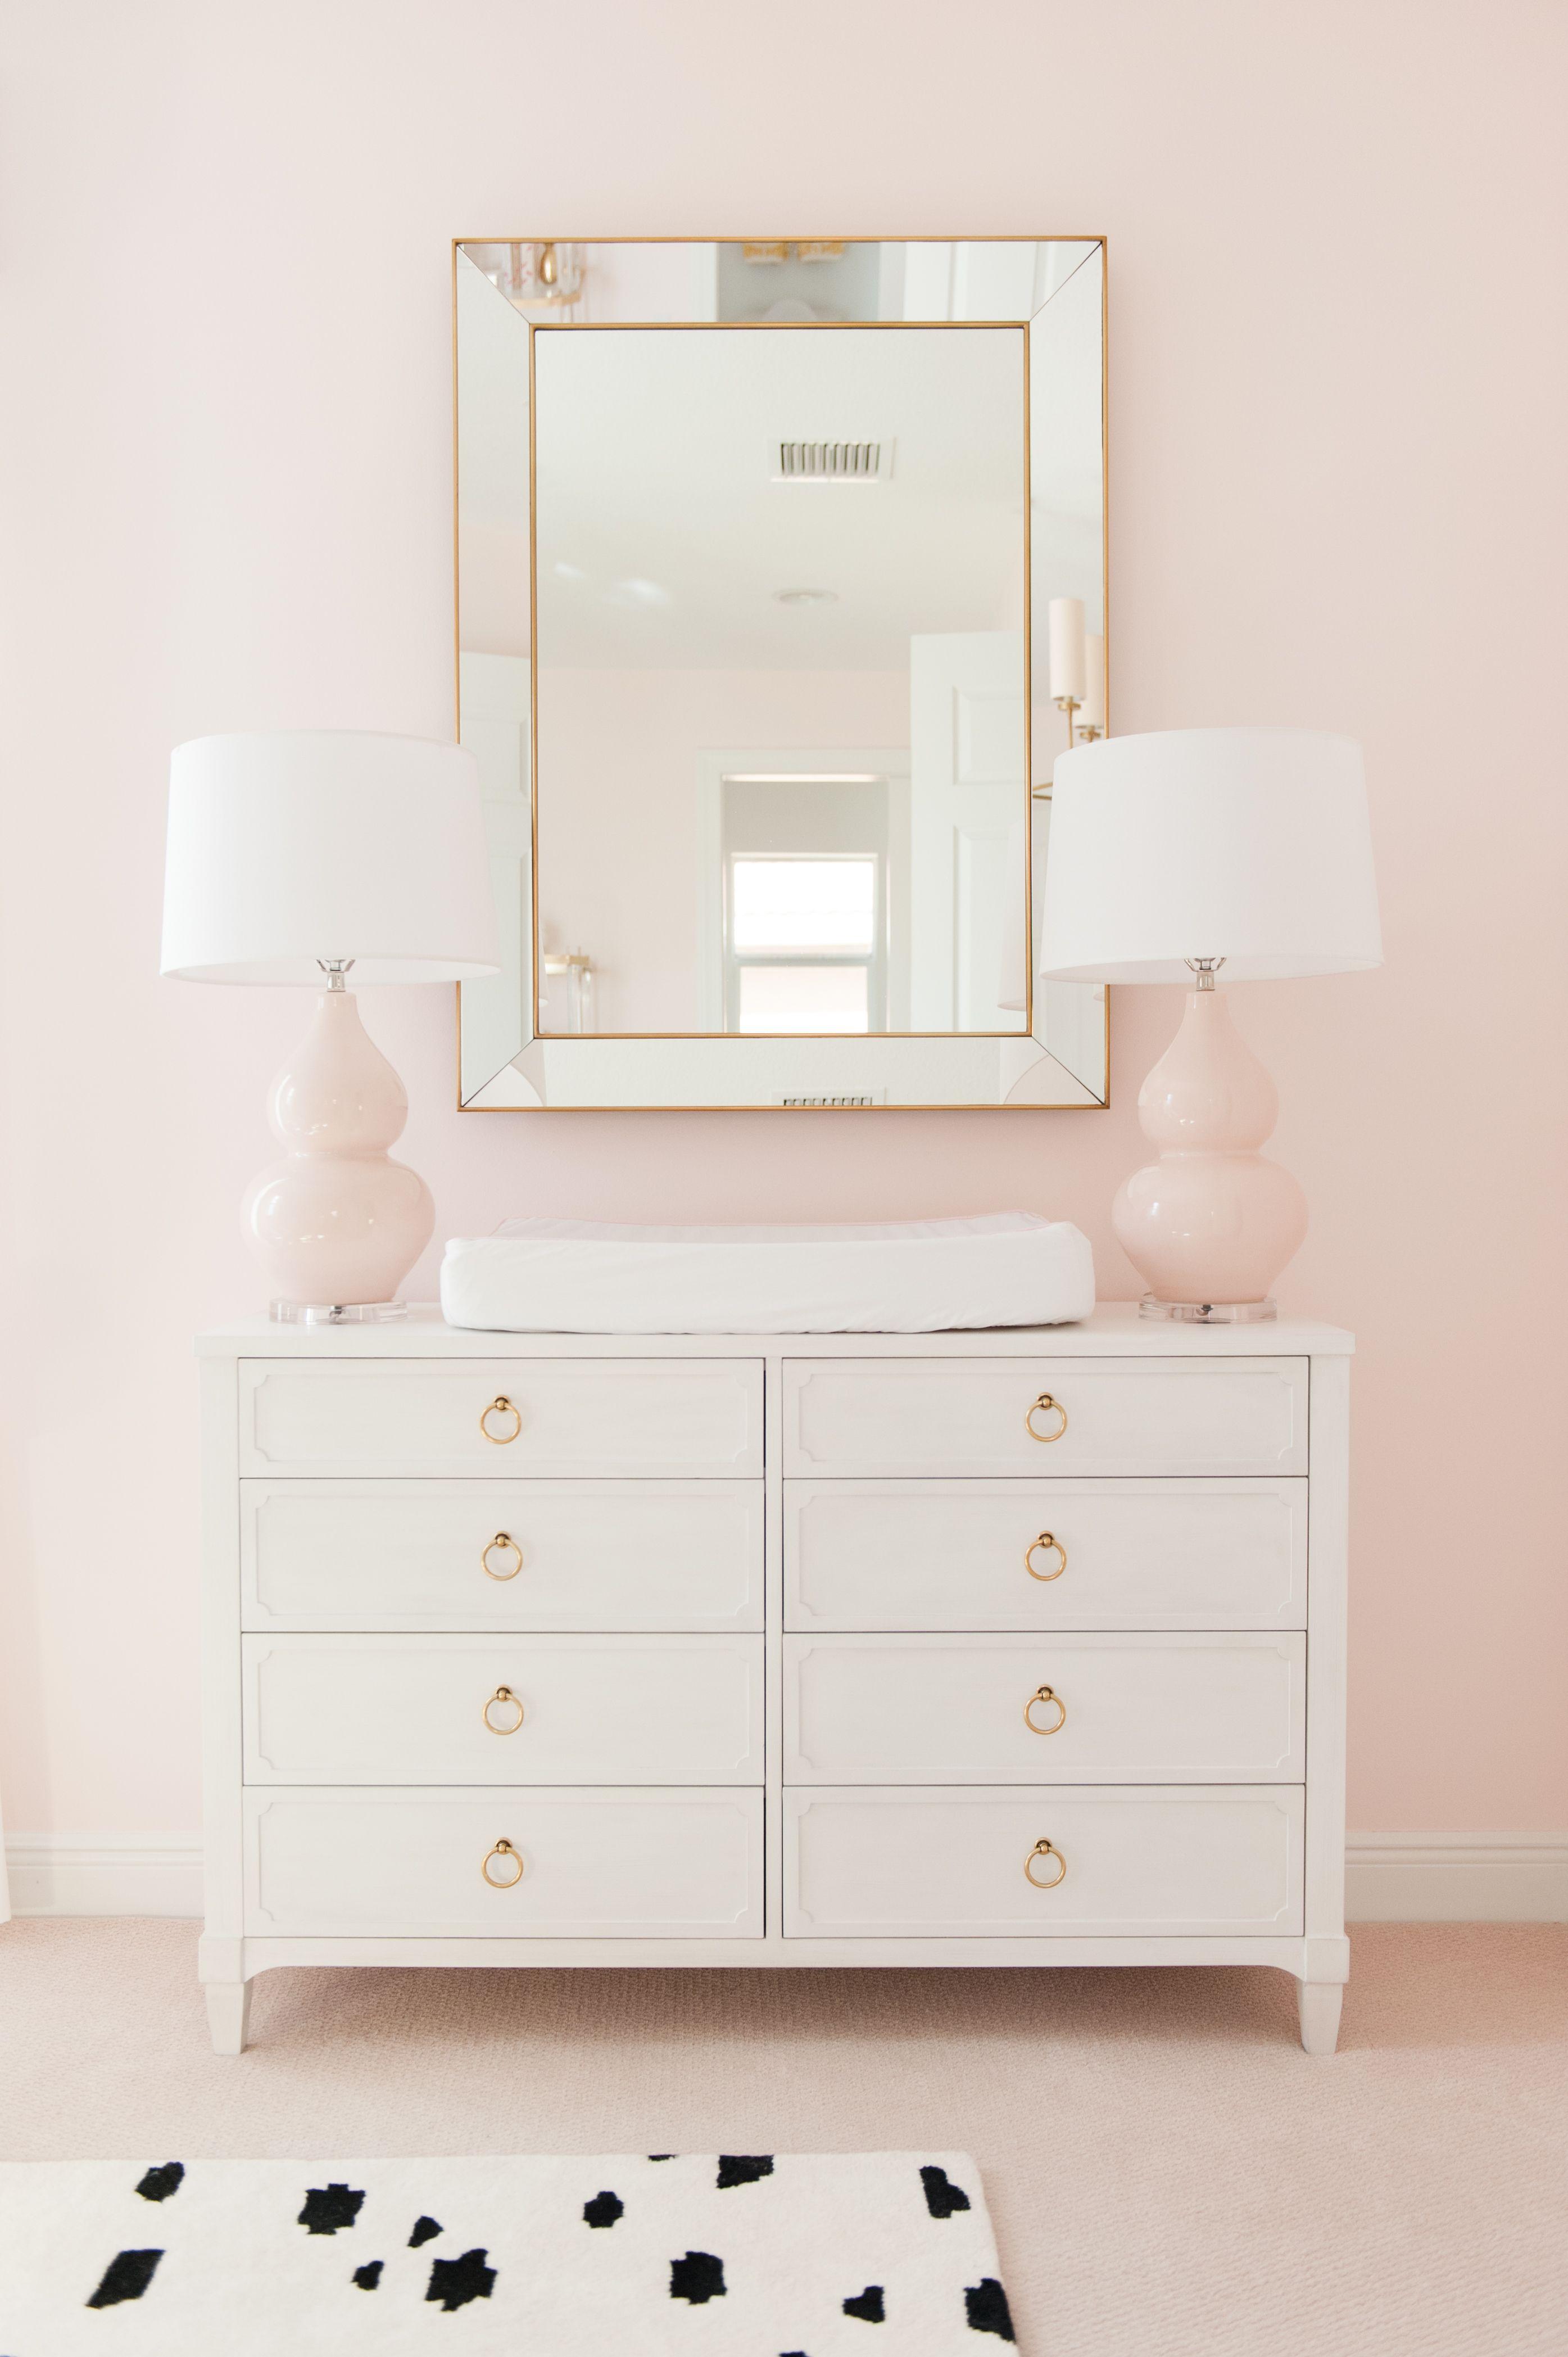 carpedine full bedroom white silver ideas ornaments com gold pink of grey size and decor